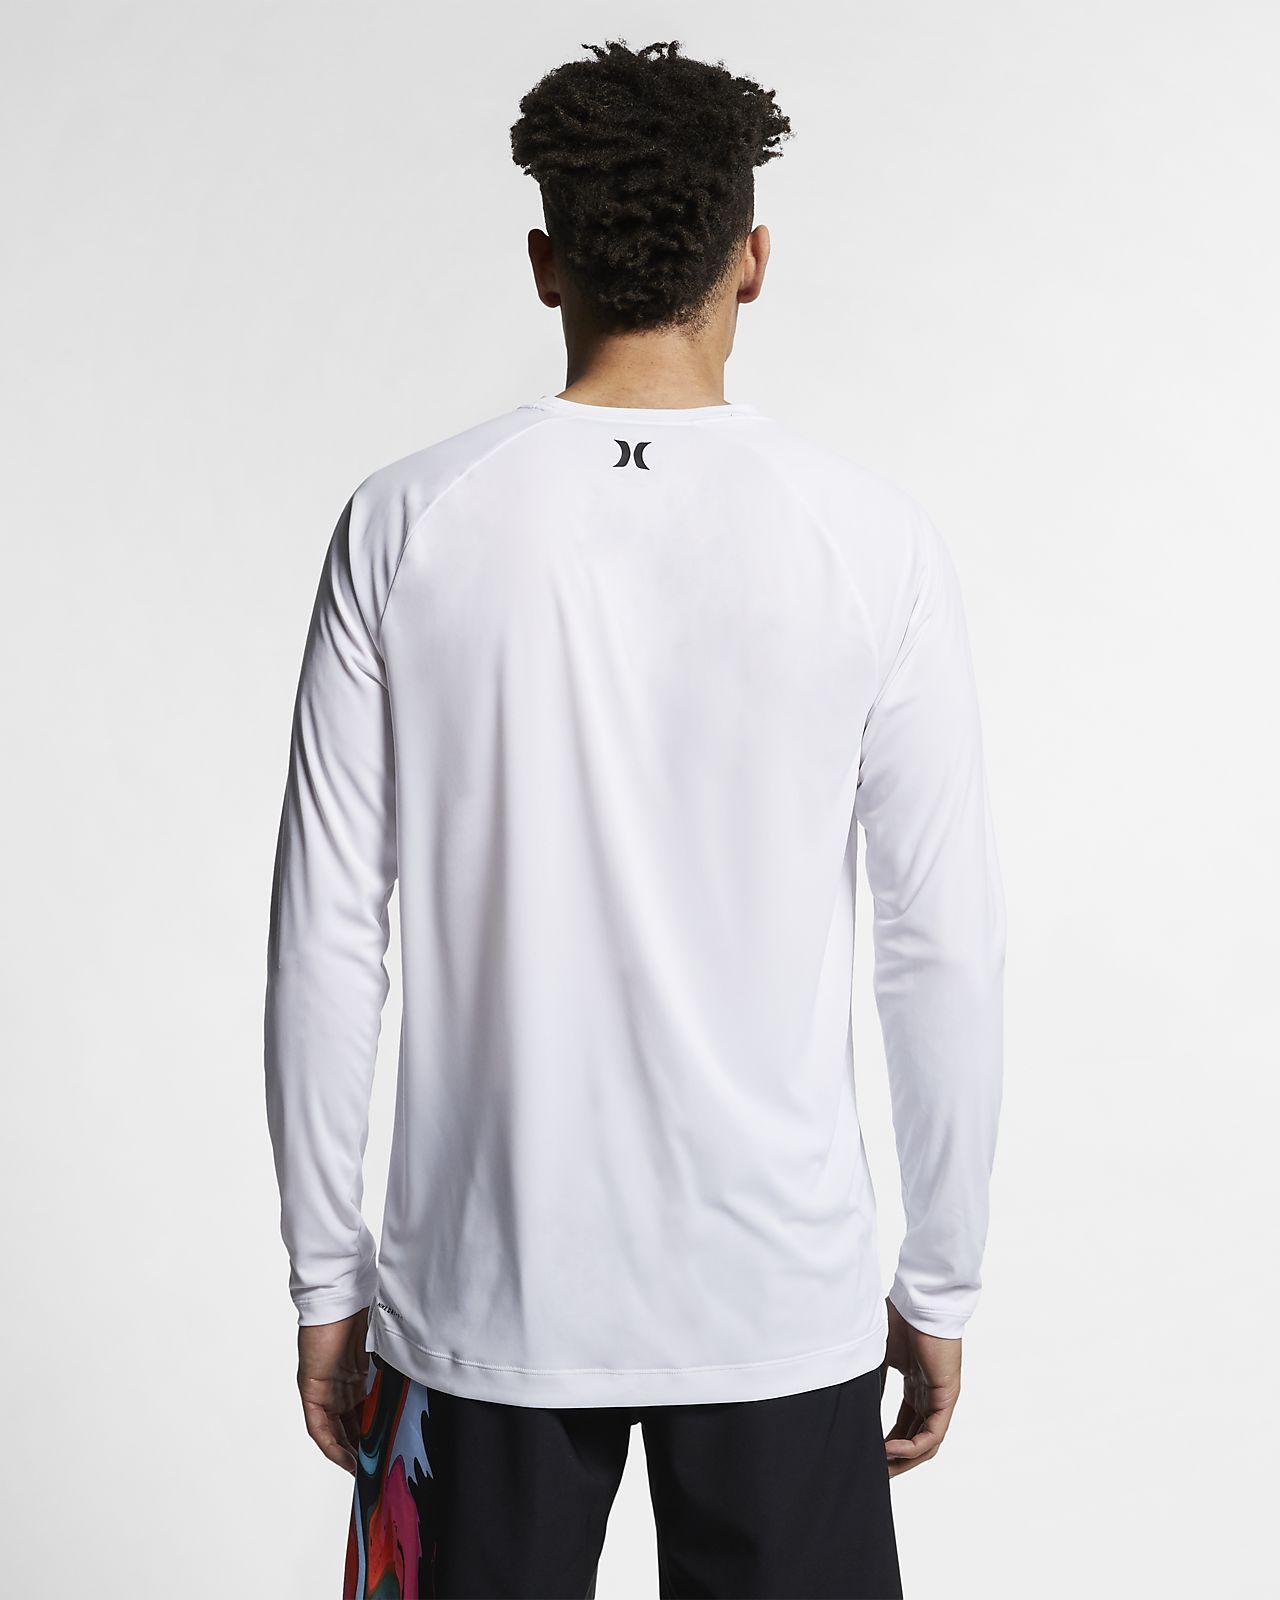 b758166bc9b8 Hurley Quick Dry Men s Long-Sleeve T-Shirt. Nike.com GB